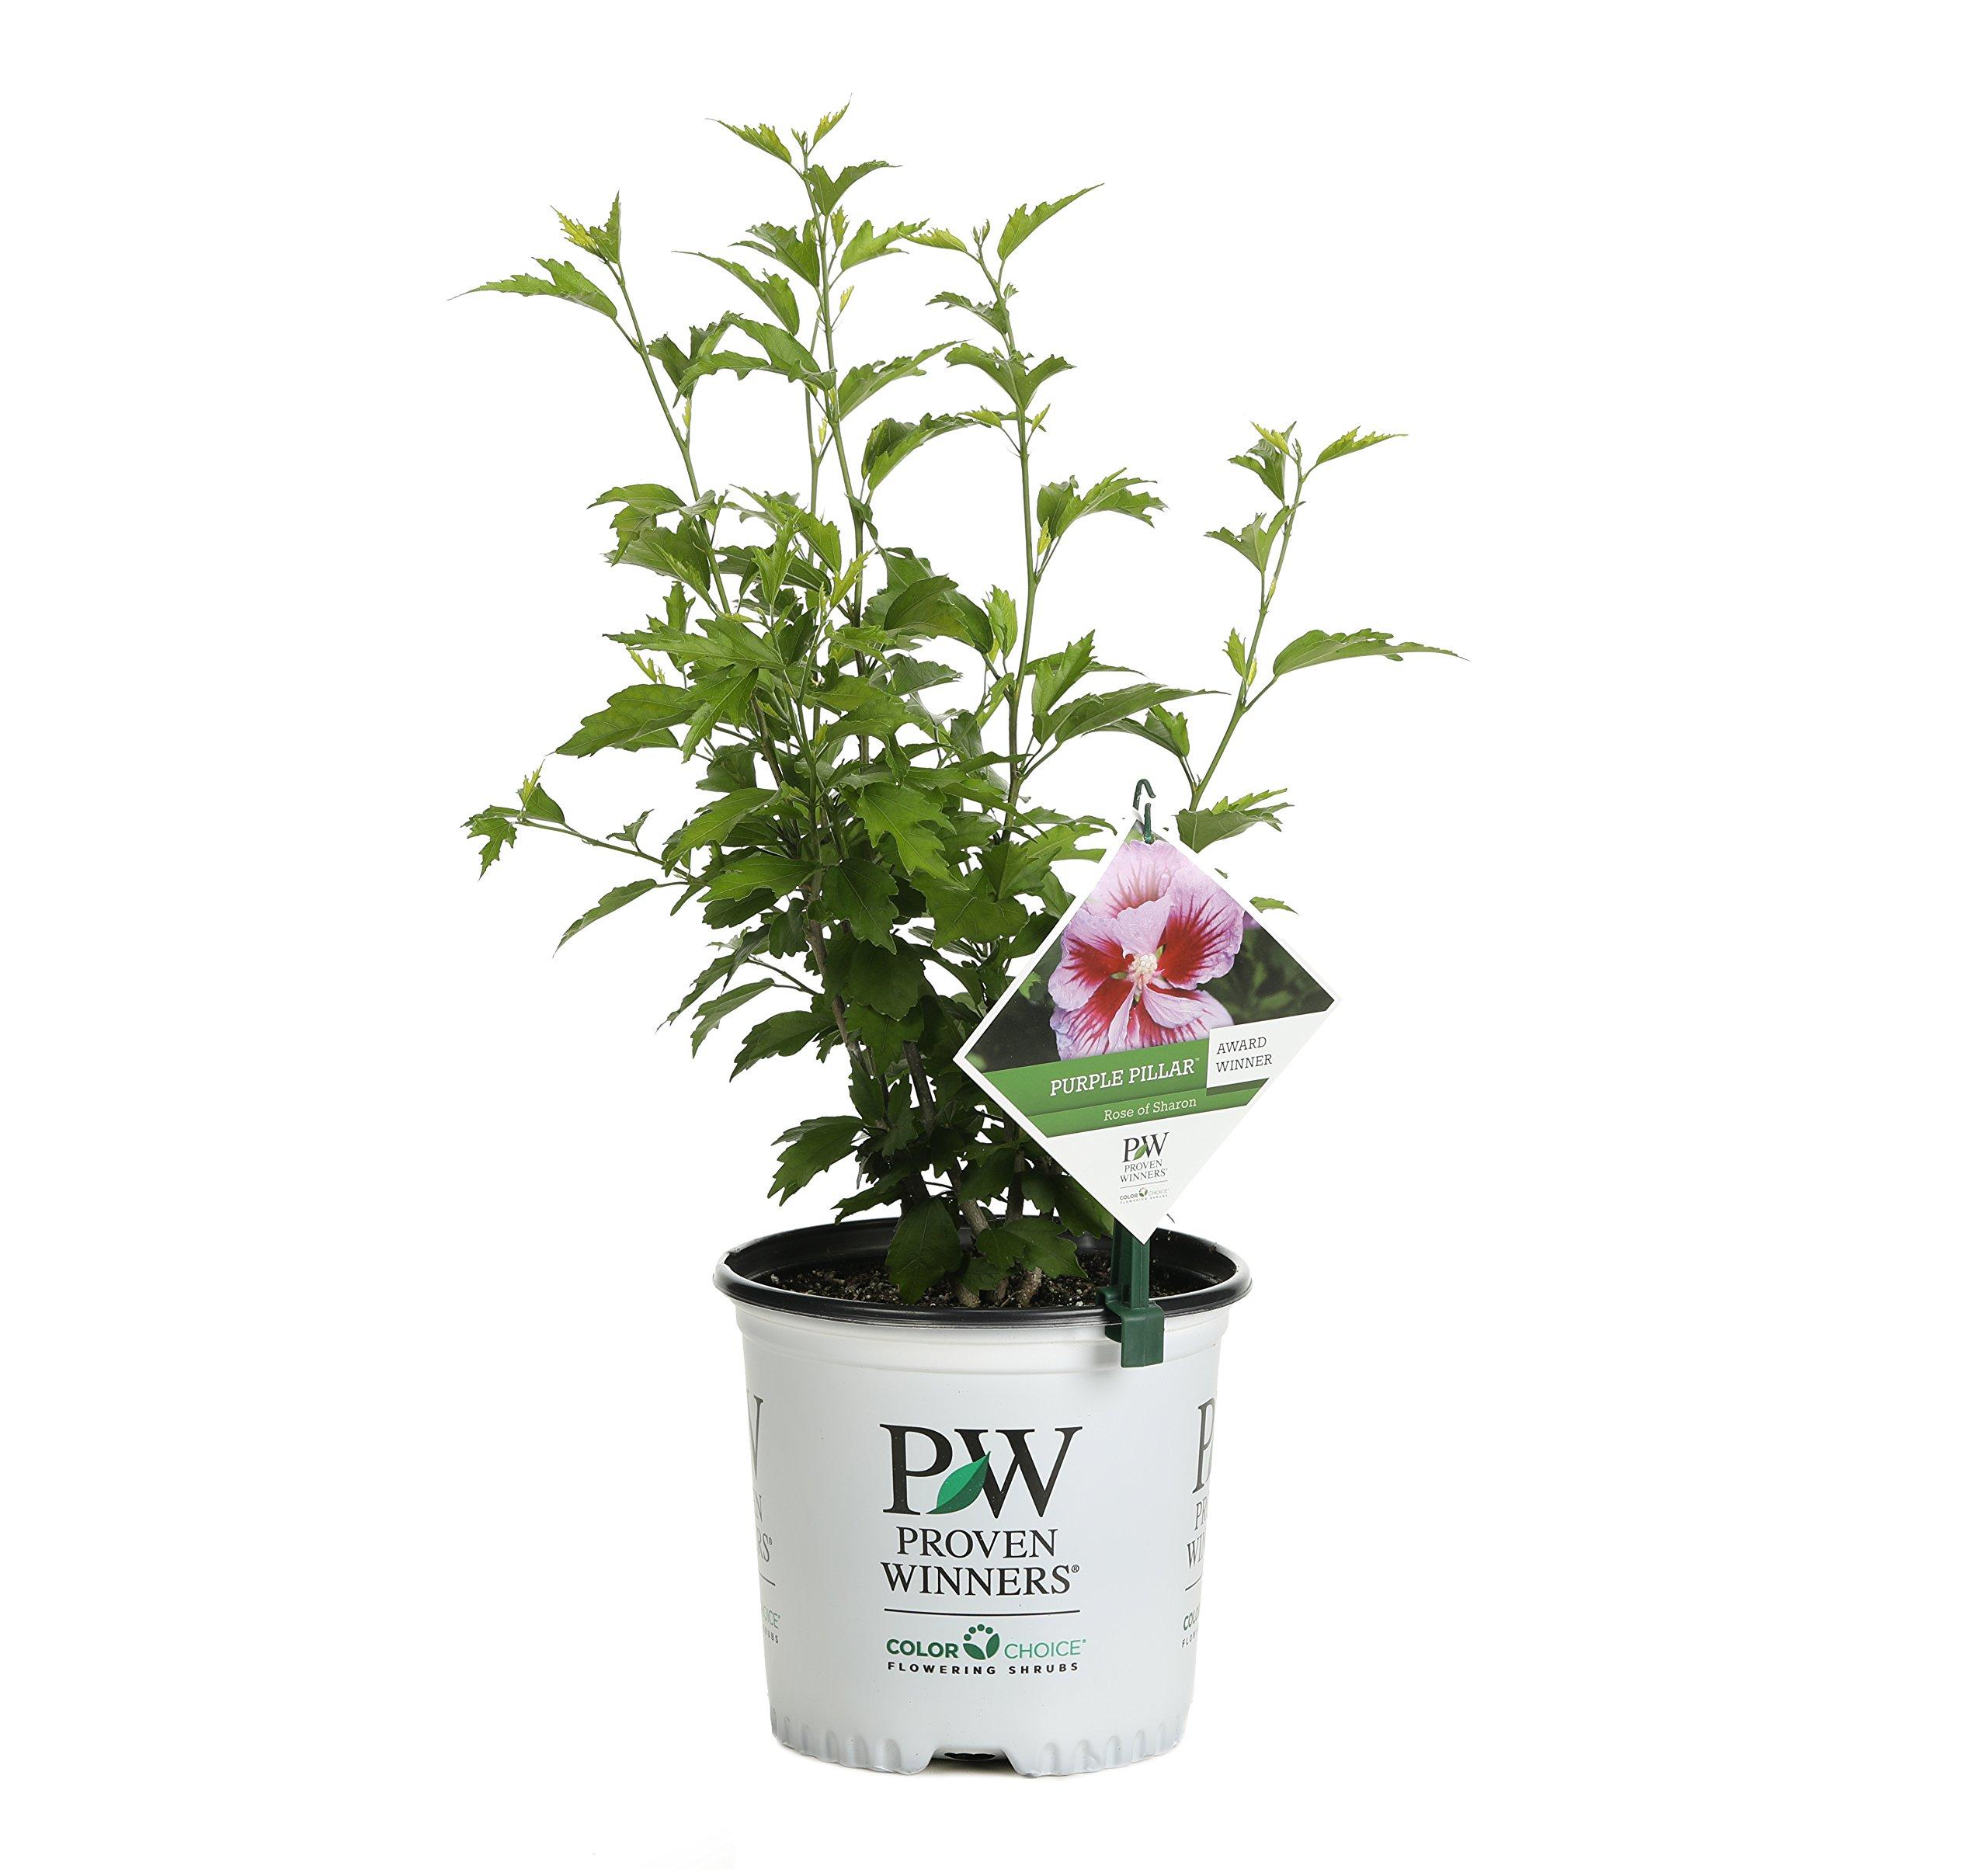 Purple Pillar Rose of Sharon (Hibiscus) Live Shrub, Purple Flowers, 1 Gallon by Proven Winners